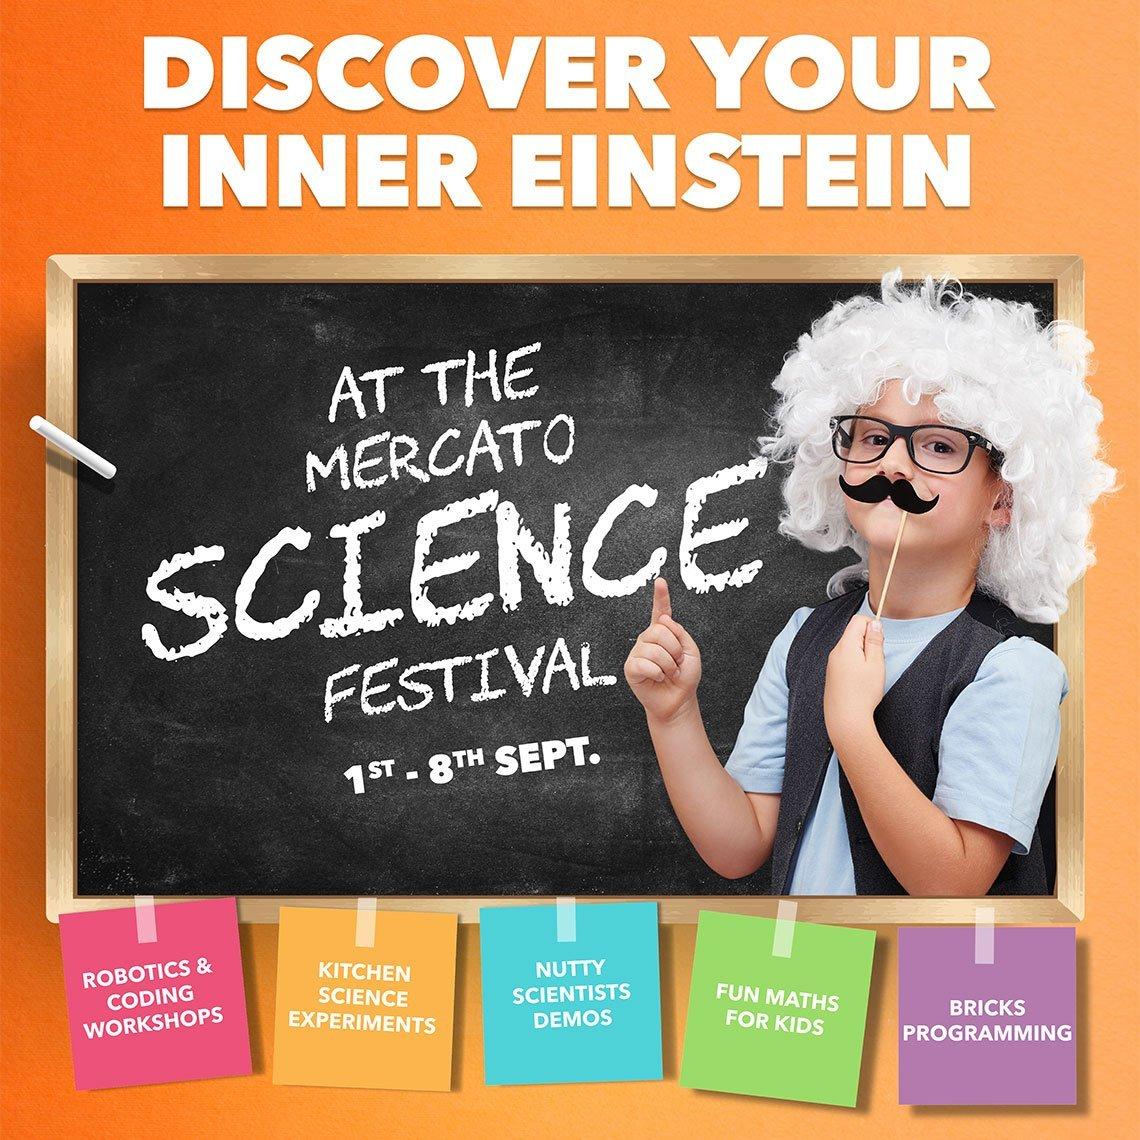 Back to School Science Festival